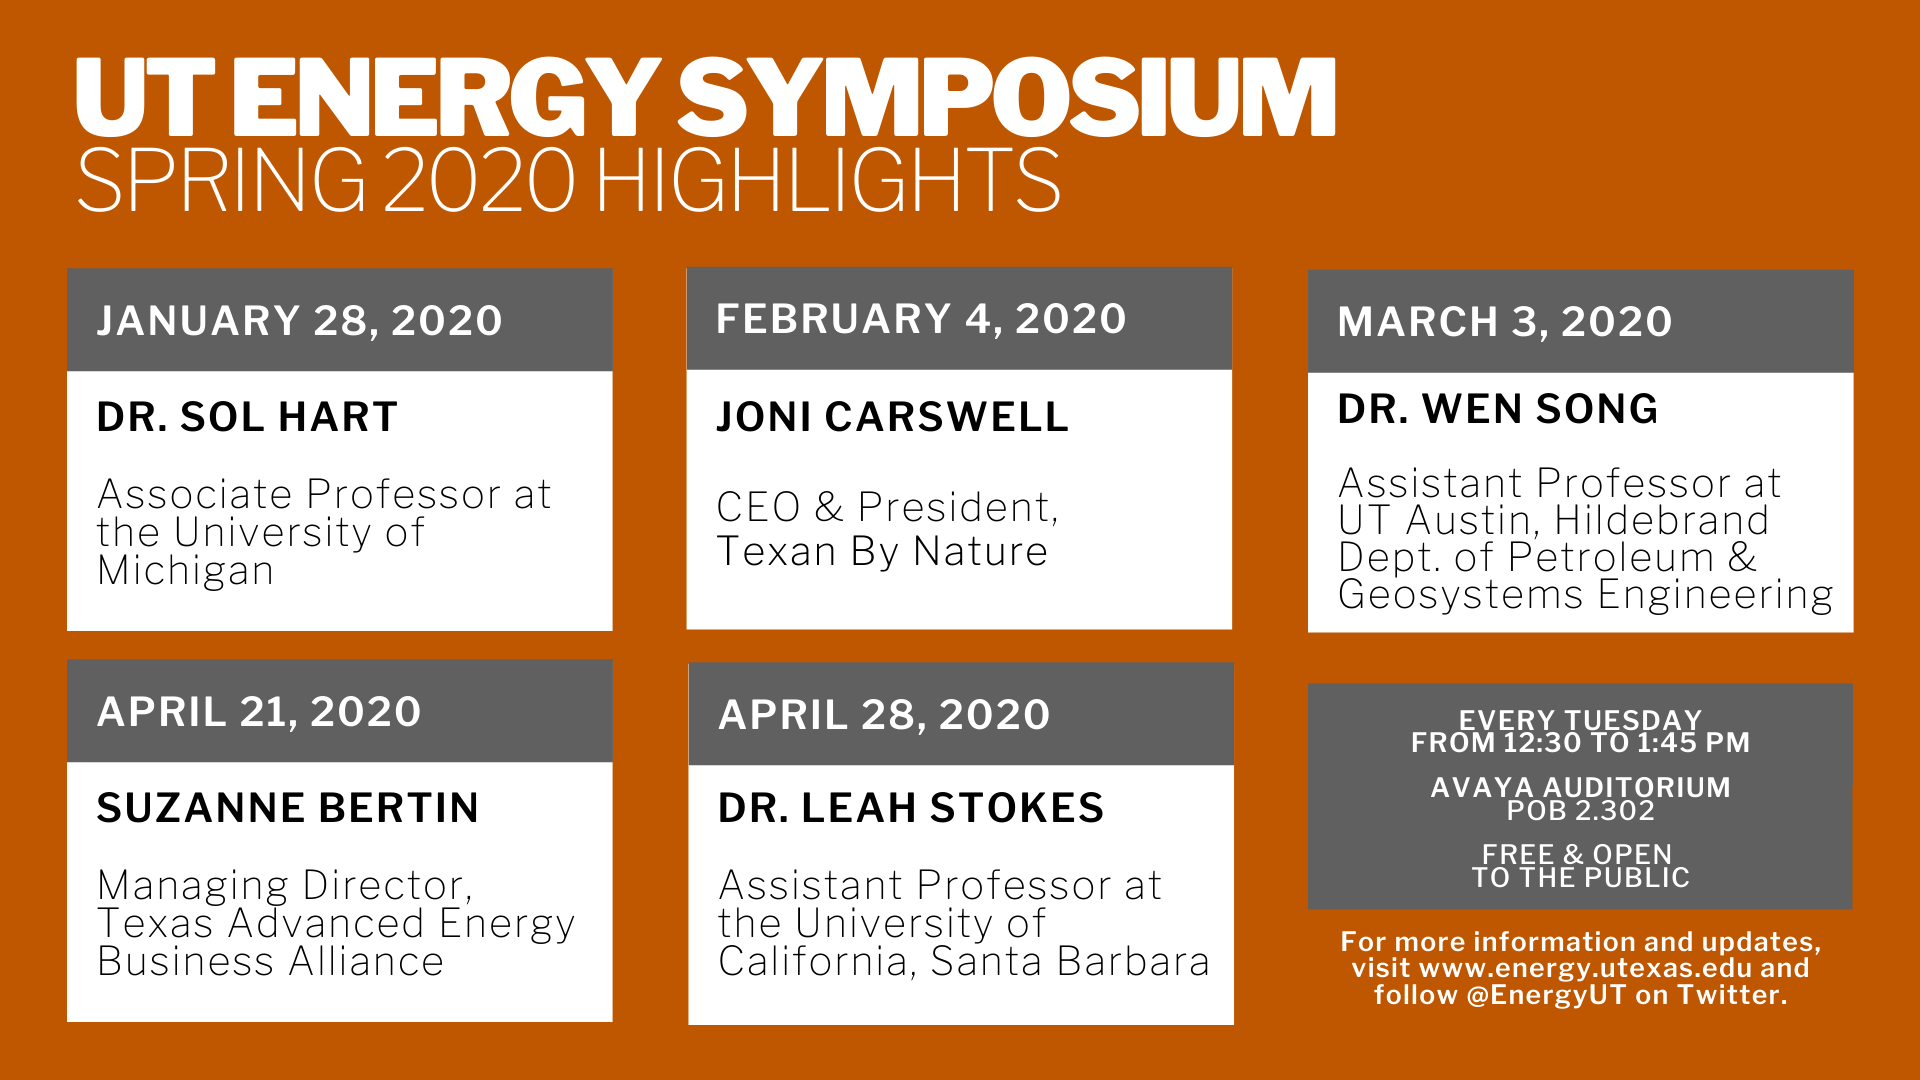 UT Energy Symposium Spring 2020 Highlights